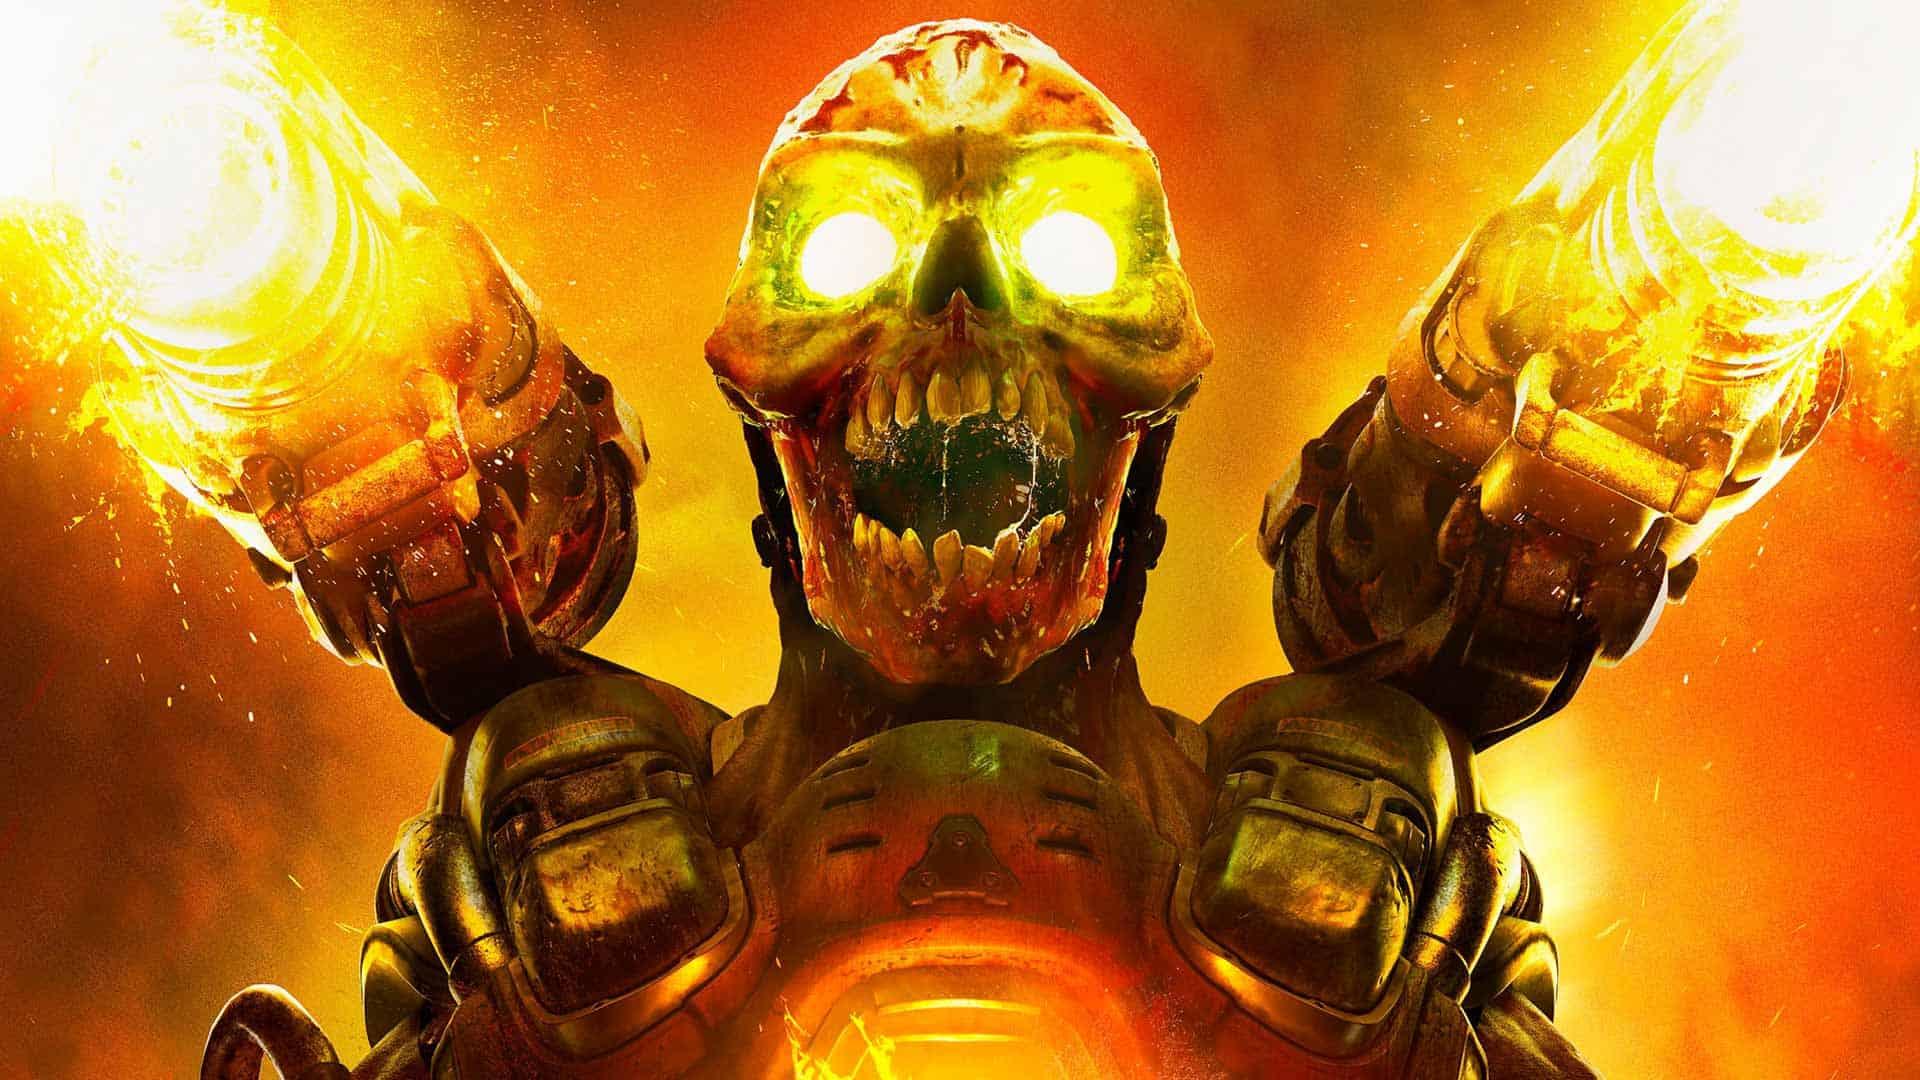 بازی ویدیویی دووم (عذاب) - DOOM Video Game